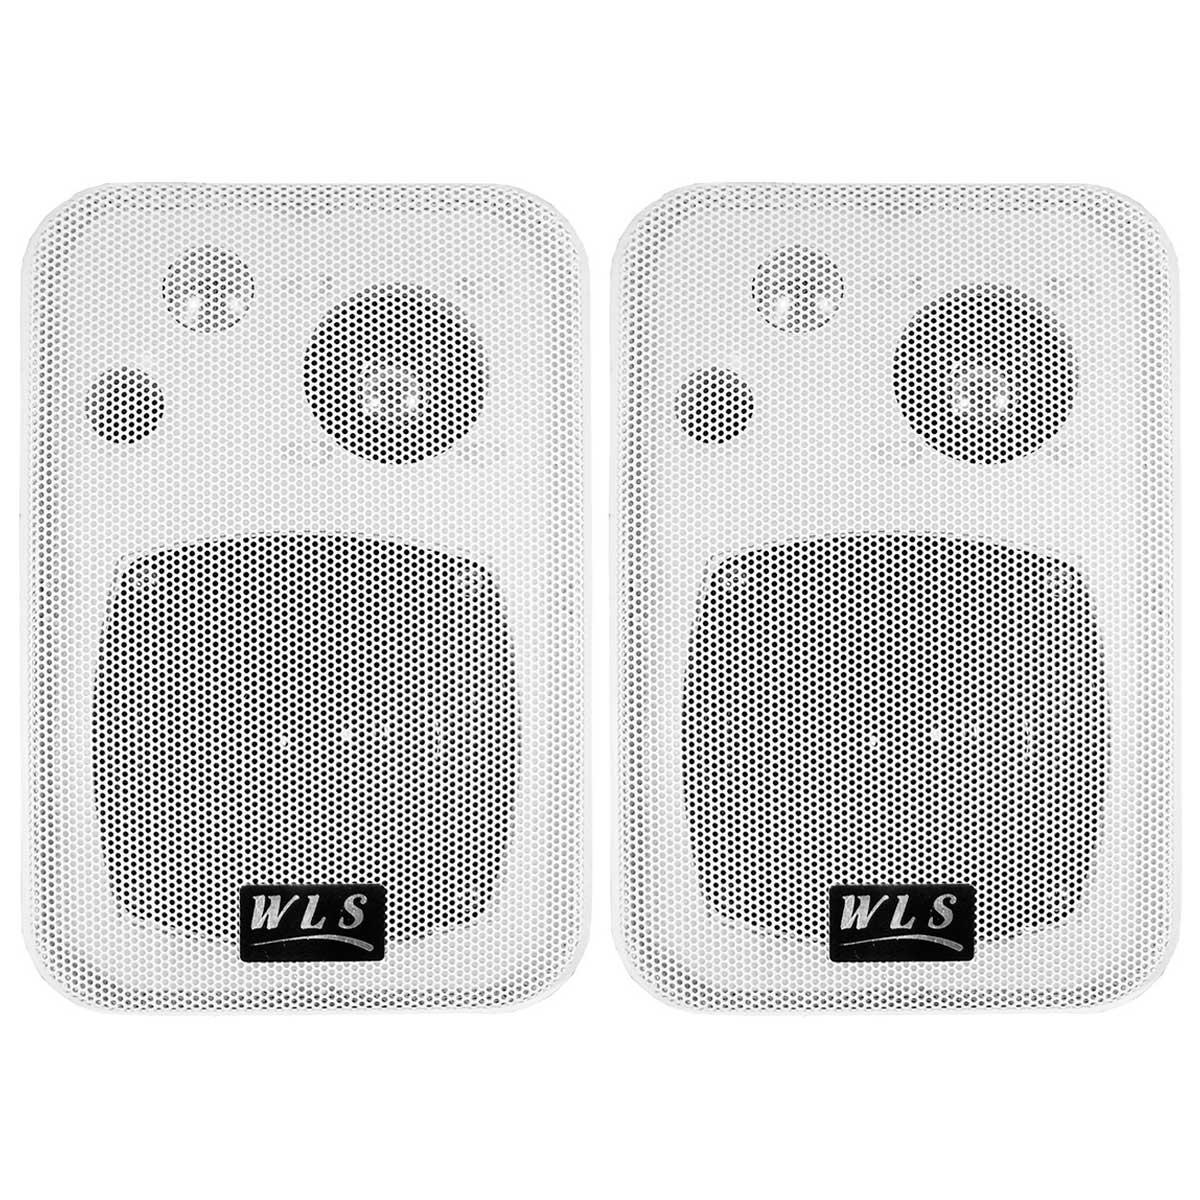 Caixa Passiva 50W Branca c/ Suporte ( Par ) M 4 - WLS